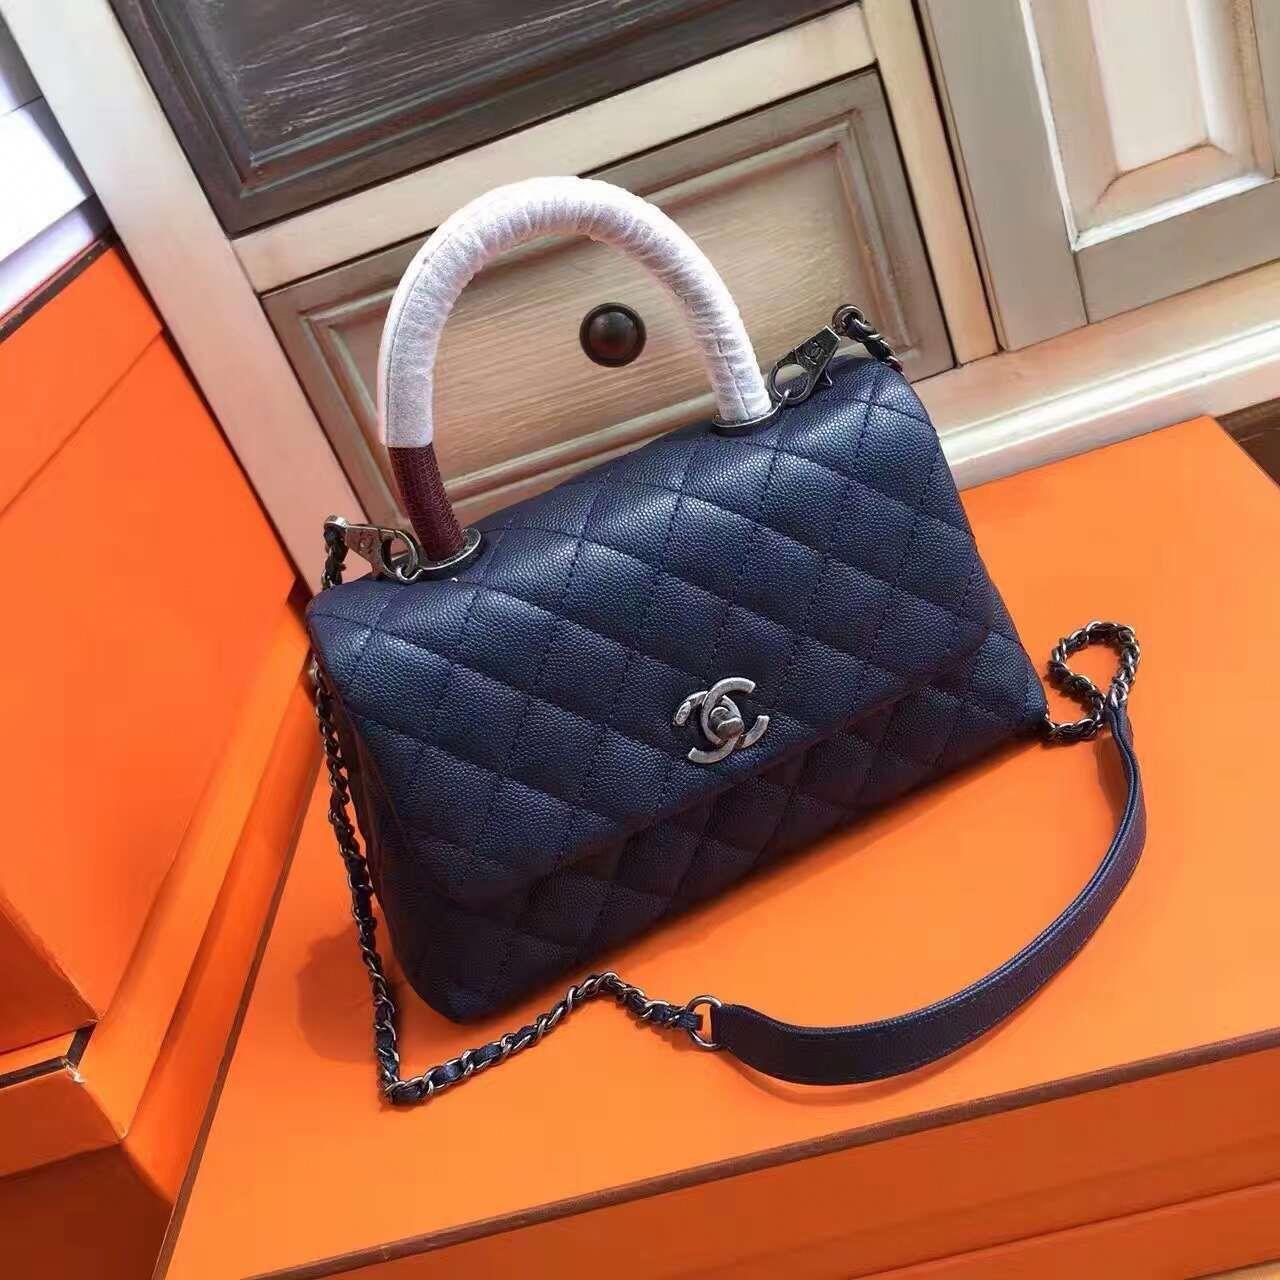 Chanel Blue Calfskin Lizard Coco Handle Small Bag - Bella Vita Moda ... 4fb554a72a4f5